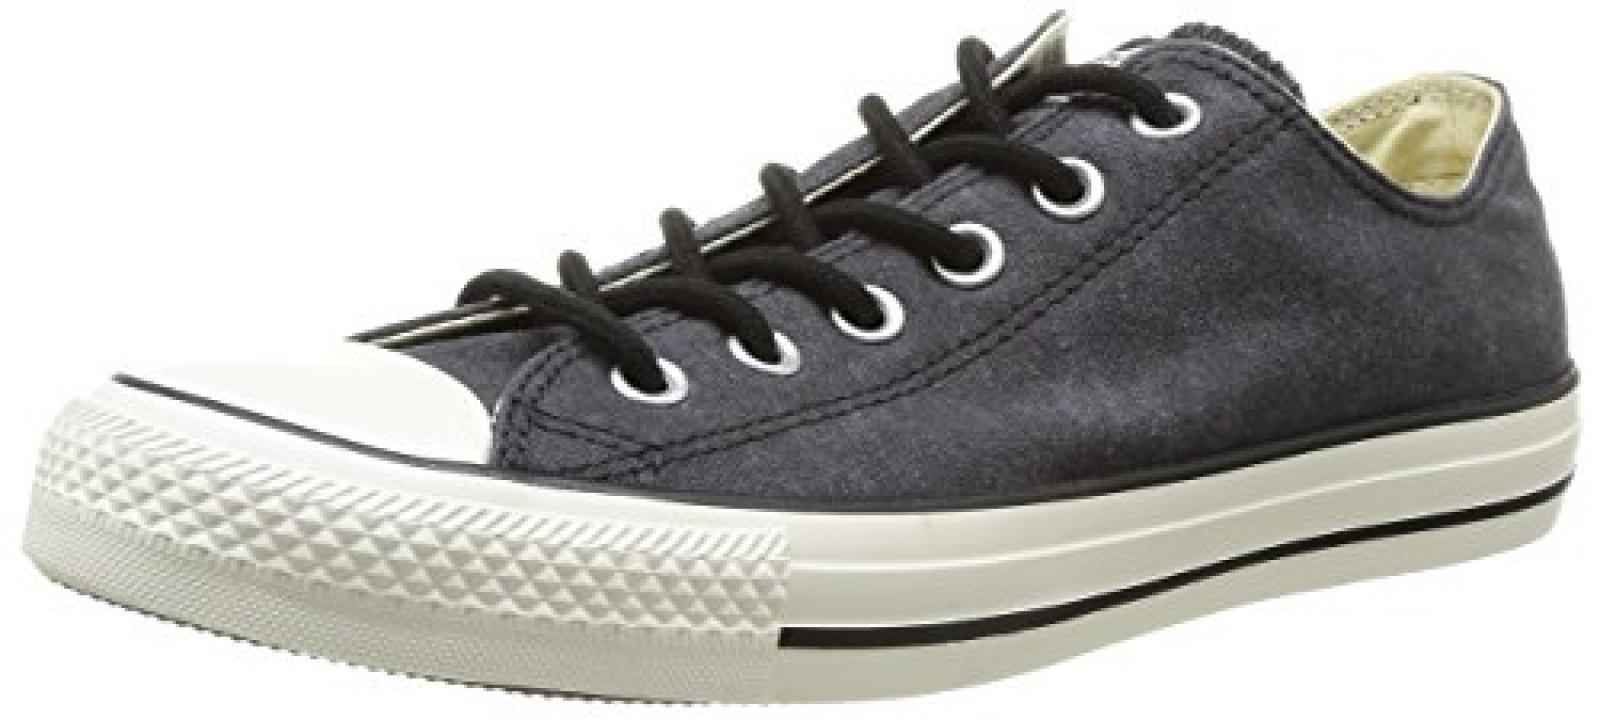 Converse Chuck Taylor All Star Adulte Basic Wash Ox 380770 Unisex - Erwachsene Sneaker